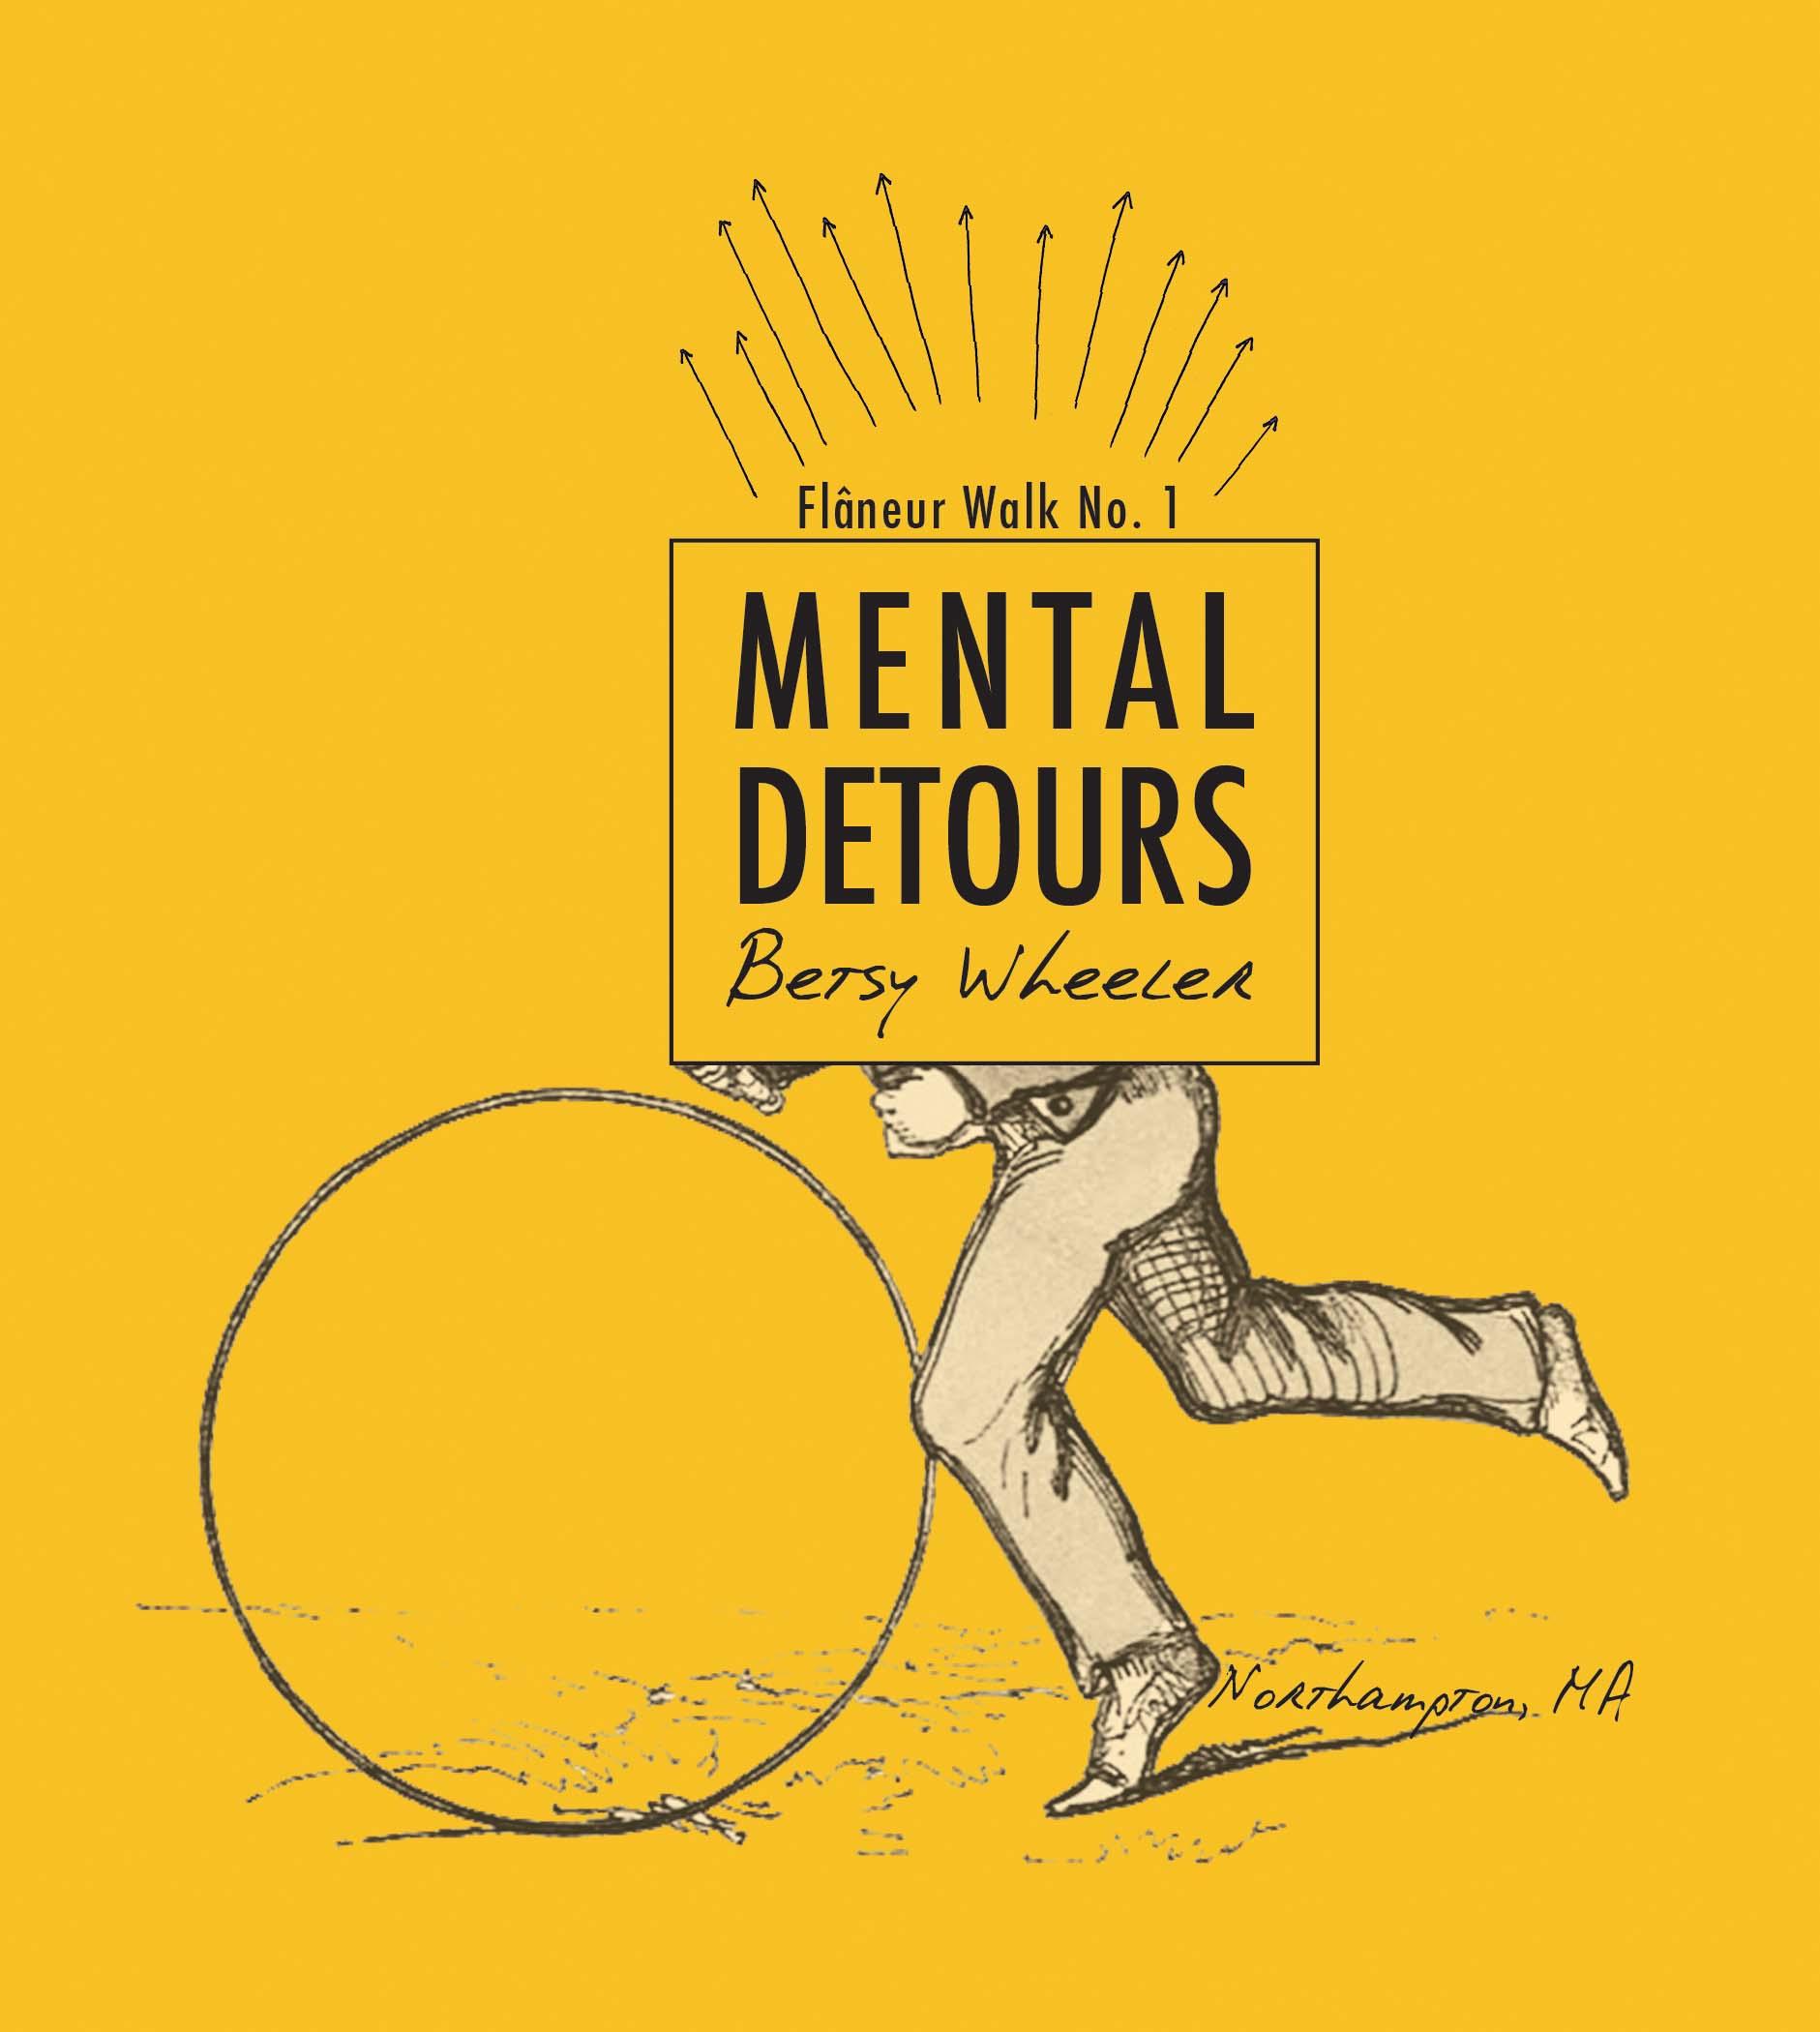 Mental Detours  by Betsy Wheeler (Shape&Nature Press, 2014) |Flâneur Walk Pamphlet Series, No. 2: Northampton, MA